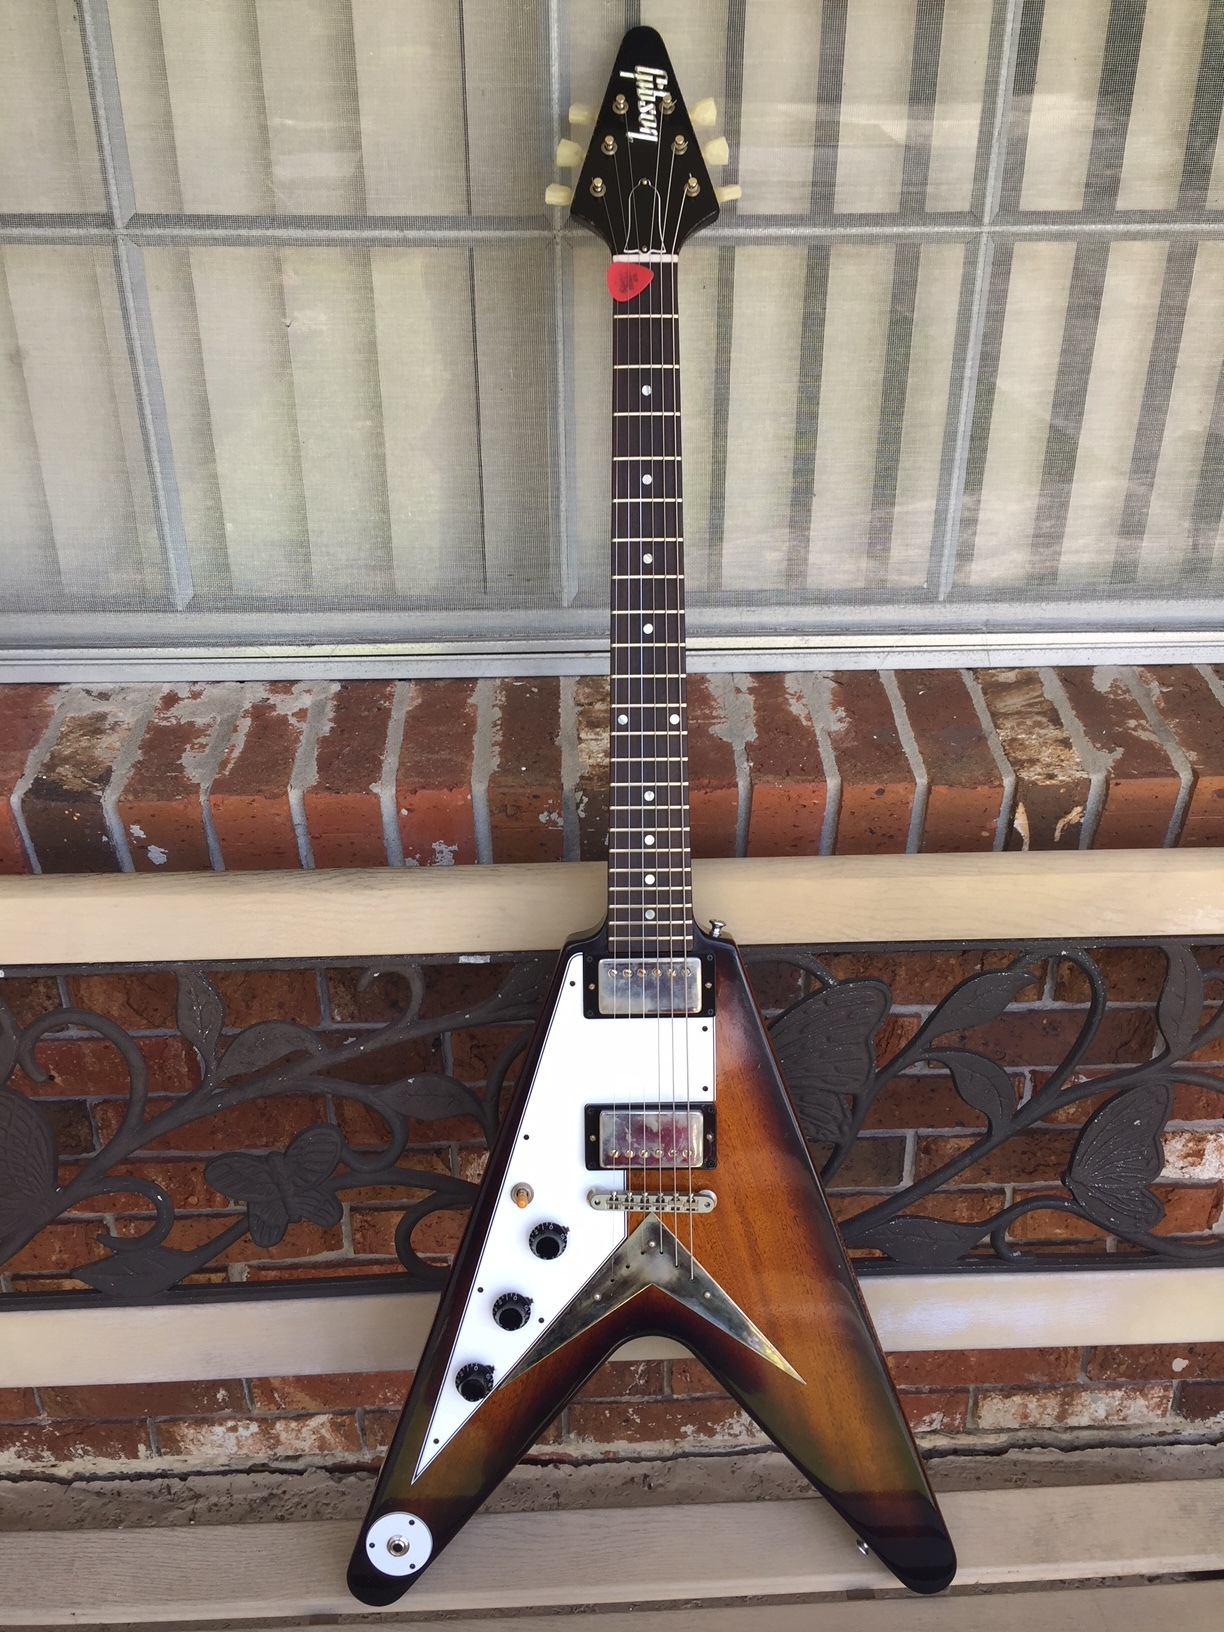 Lefty Vintage Guitars 1967 Gibson Sg Wiring Harness 2018 Custom Shop 59 Flying V Tobacco Sunburst Aged Mint With